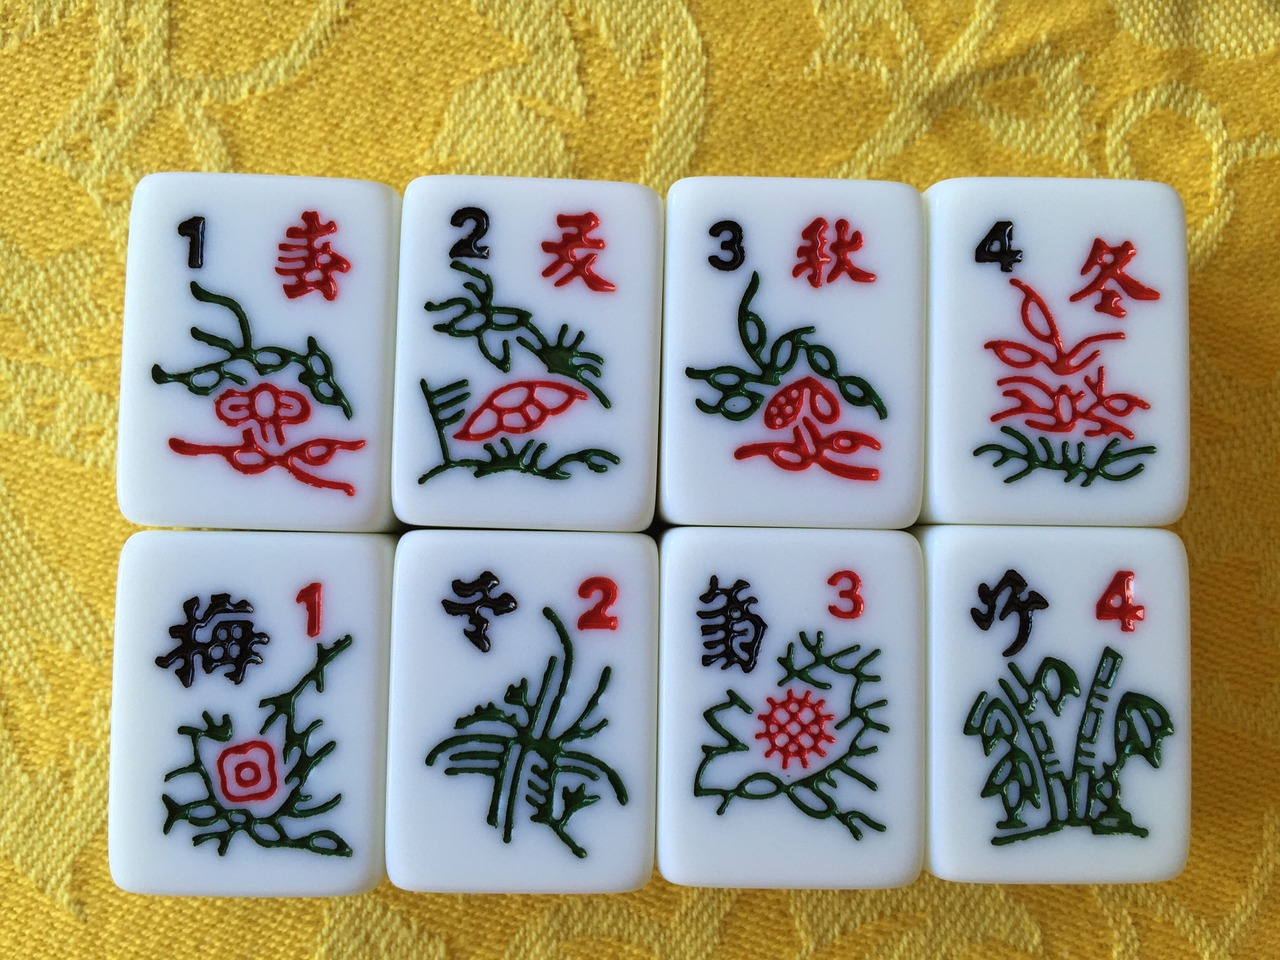 Mahjong playing pieces